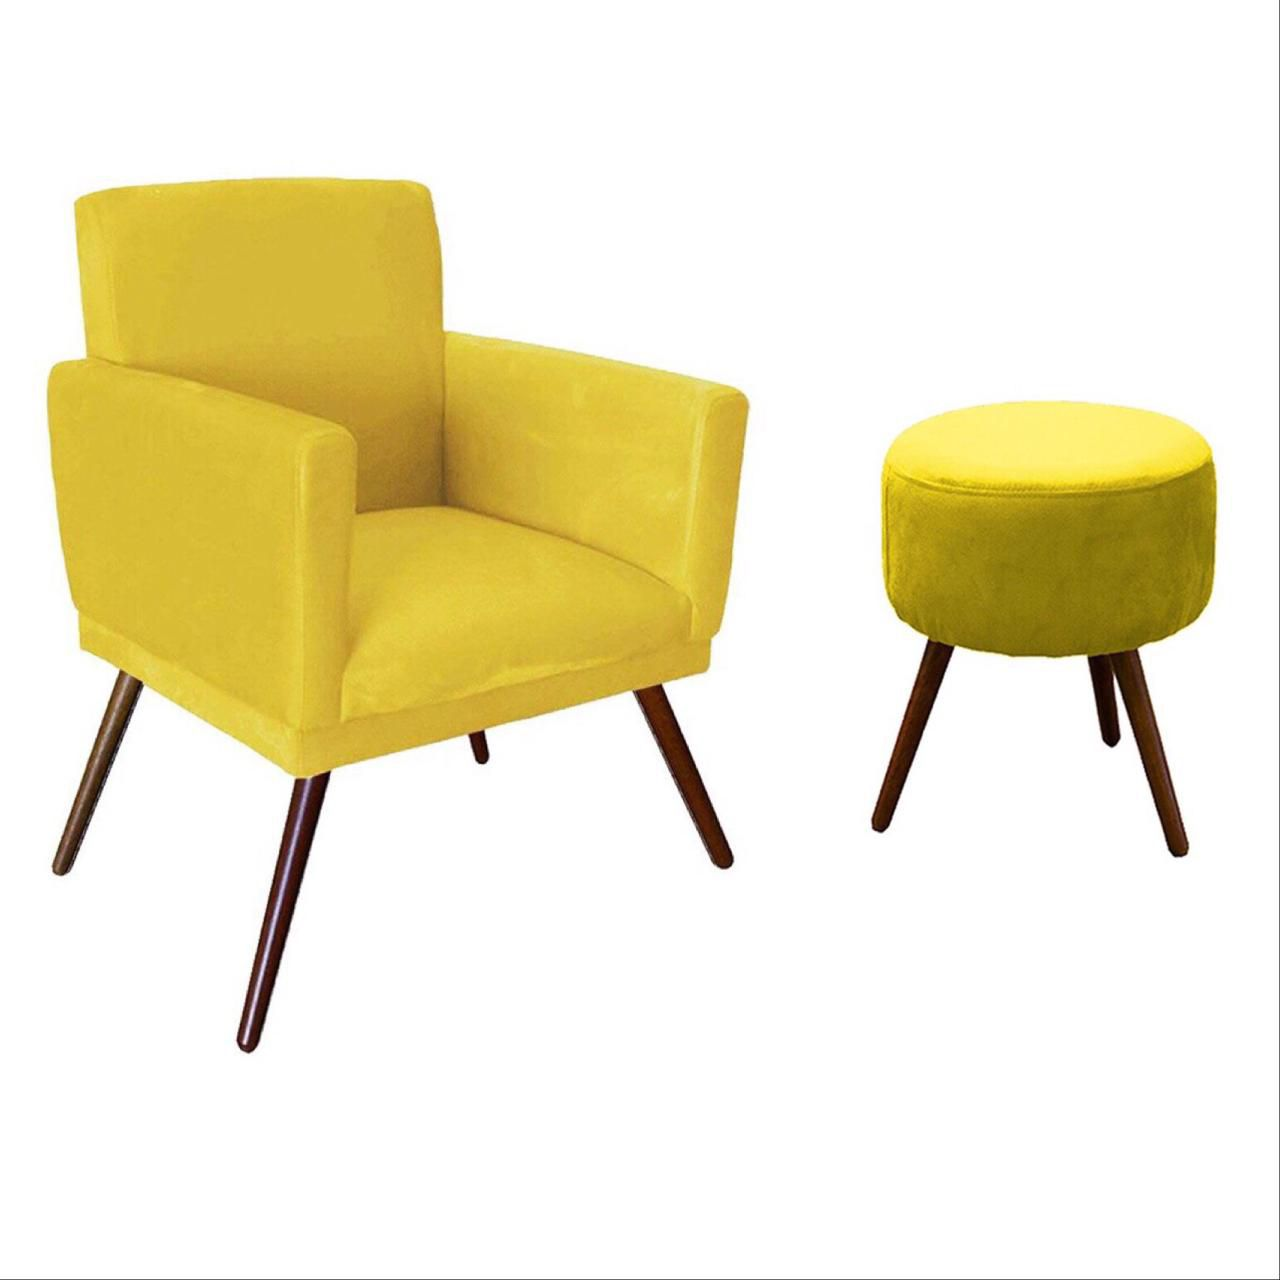 Kit Poltrona Decorativa Nina com rodapé e Puff redondo amarelo - Bela Casa shop